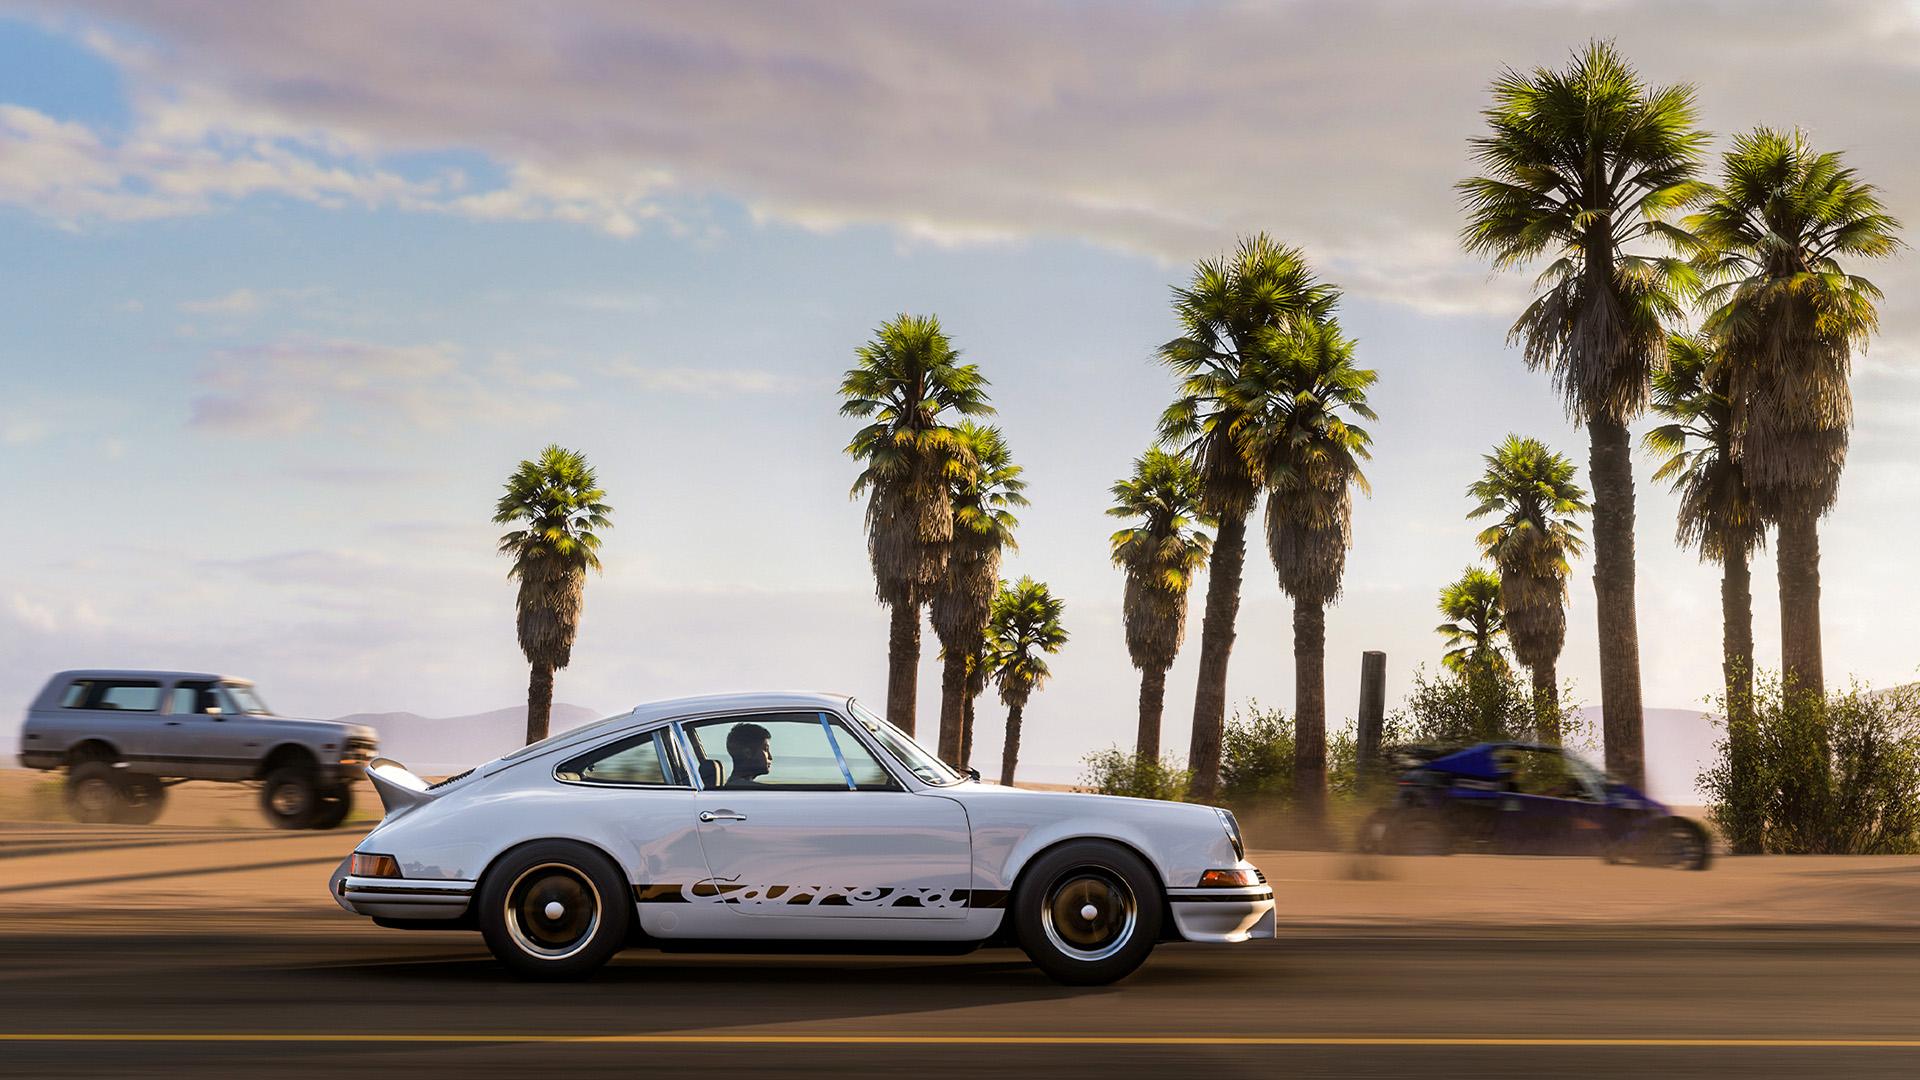 Porsche 911 showcase in Forza Horizon 5